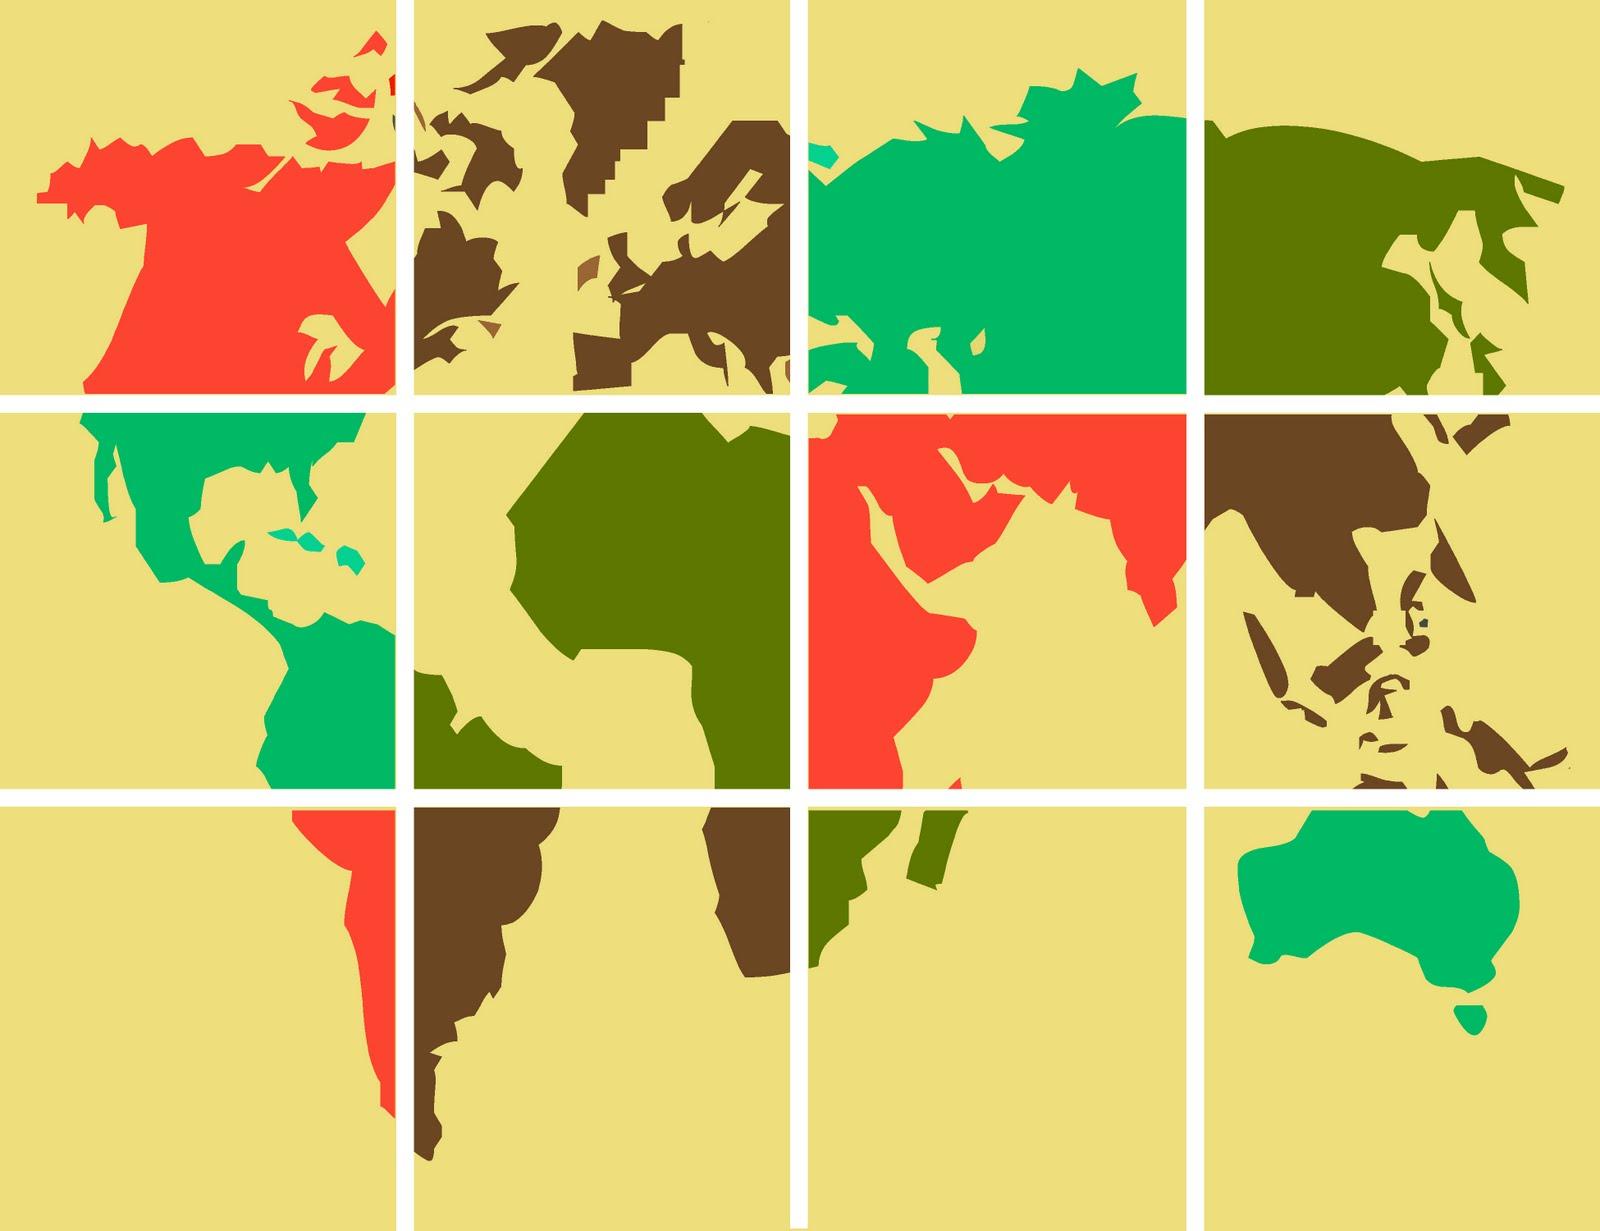 Kojotutorial interactive world map gumiabroncs Images